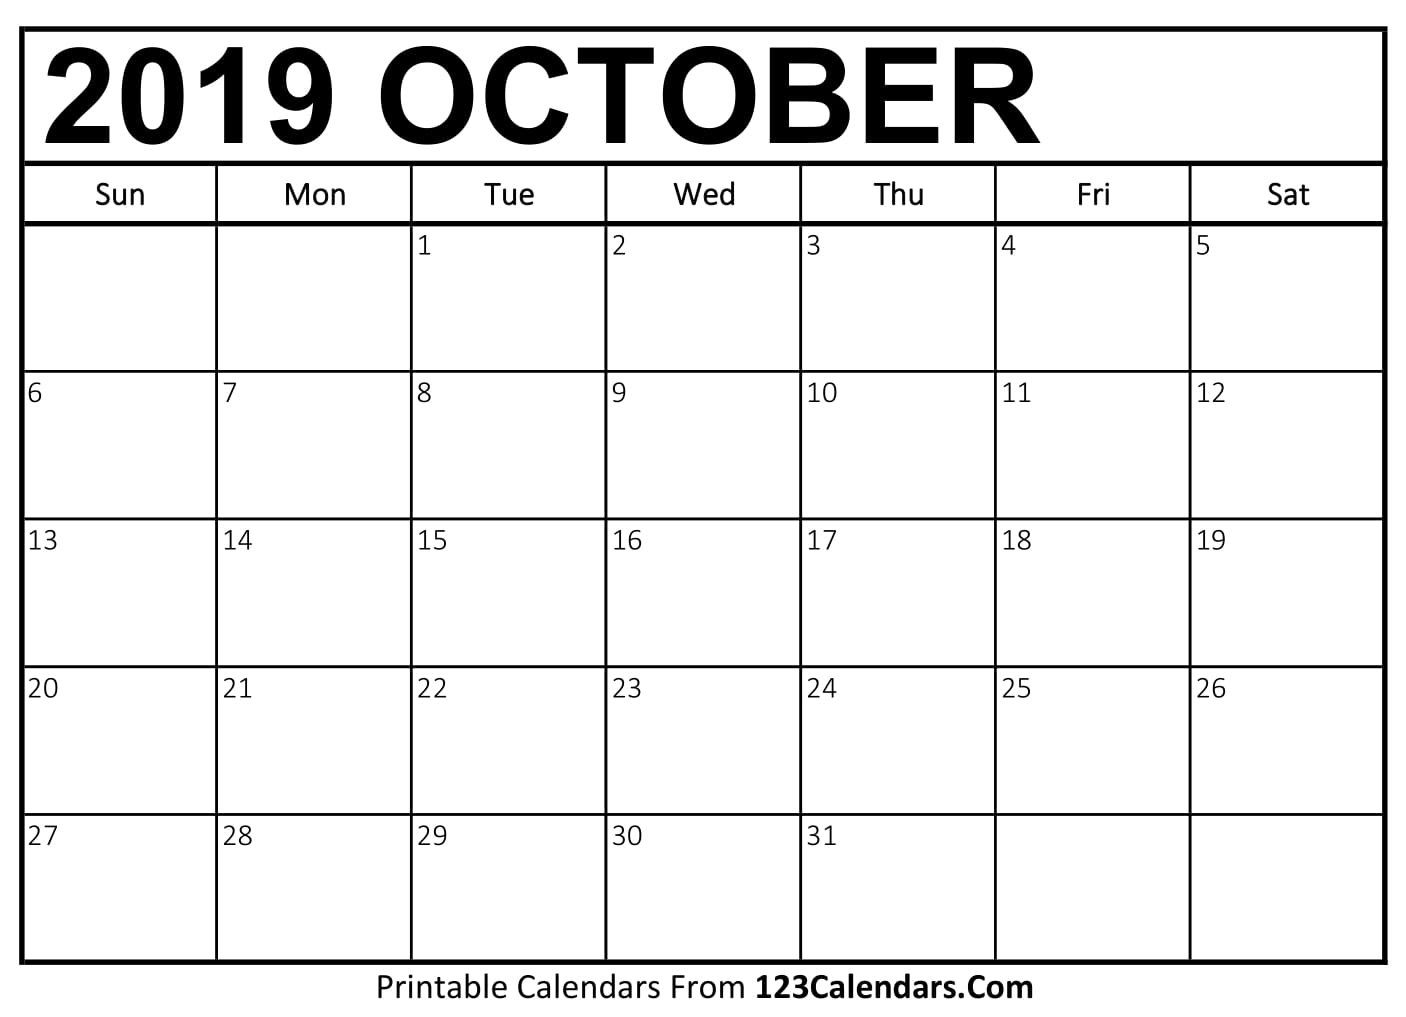 October 2019 Printable Calendar | 123Calendars January 2019 Calendar 123Calendars